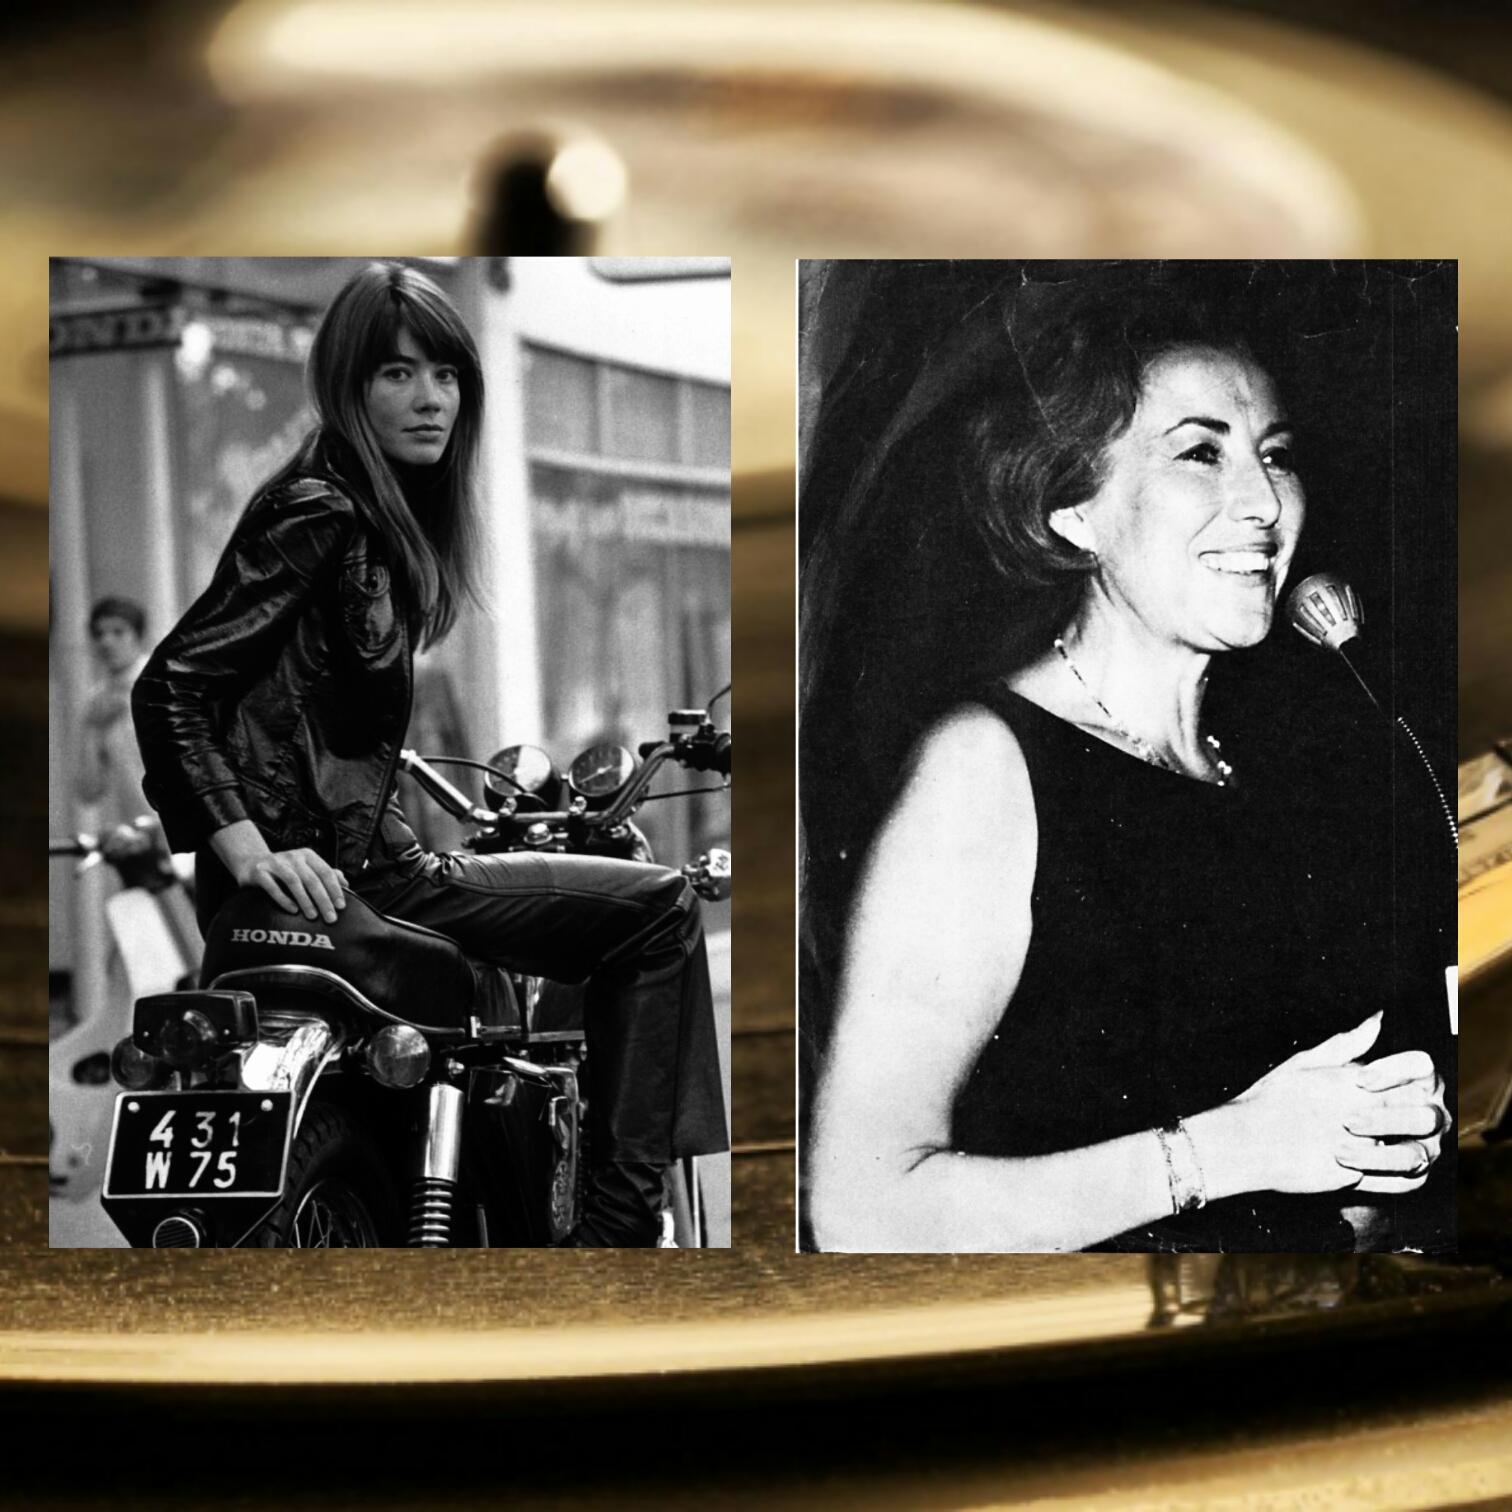 Françoise Hardy Vera Lynn 5 grandes covers traducidos #culturaquemadura